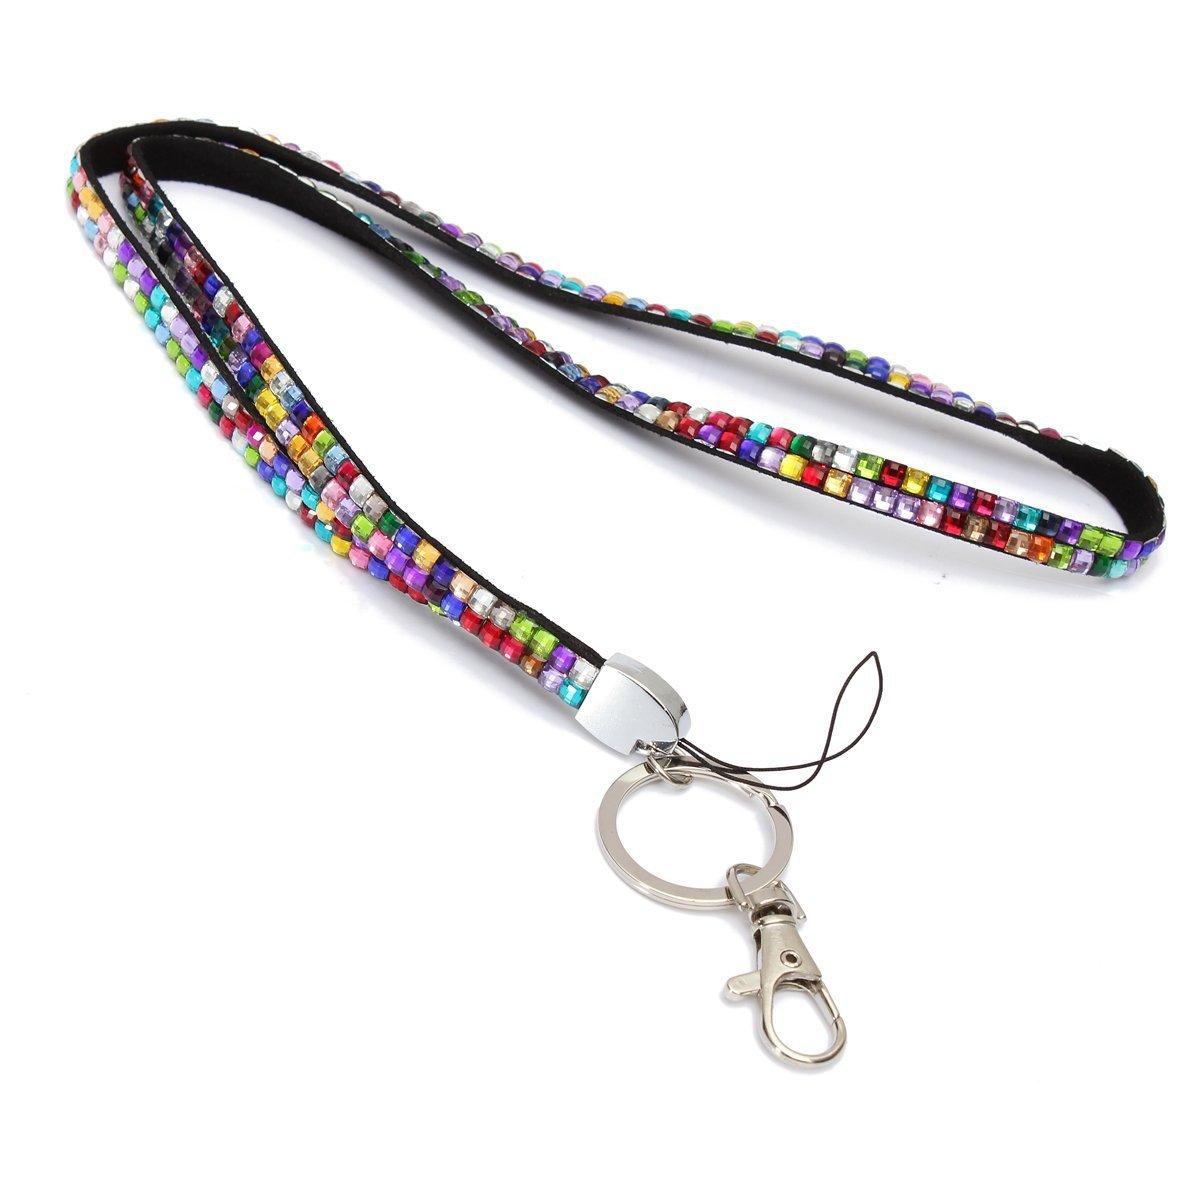 Blue Strap Lanyard Bling Crystal Custom For Id Badge Key